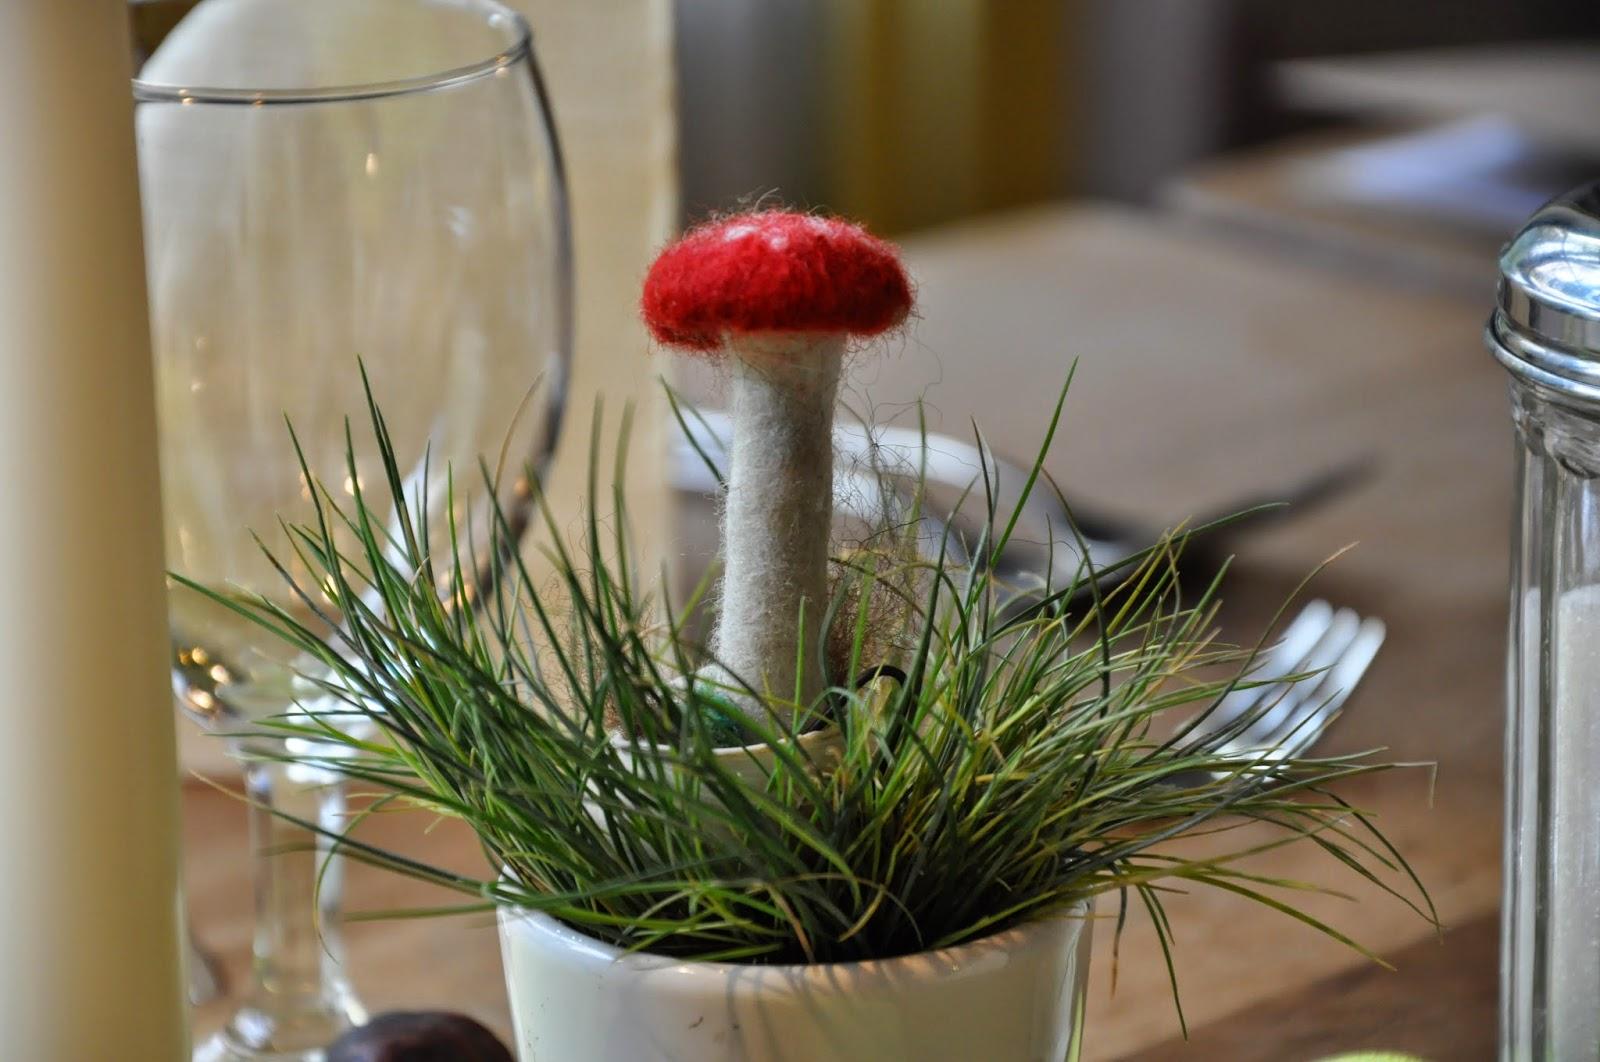 Bin im garten tischdekoration pilze - Dekoration pilze ...